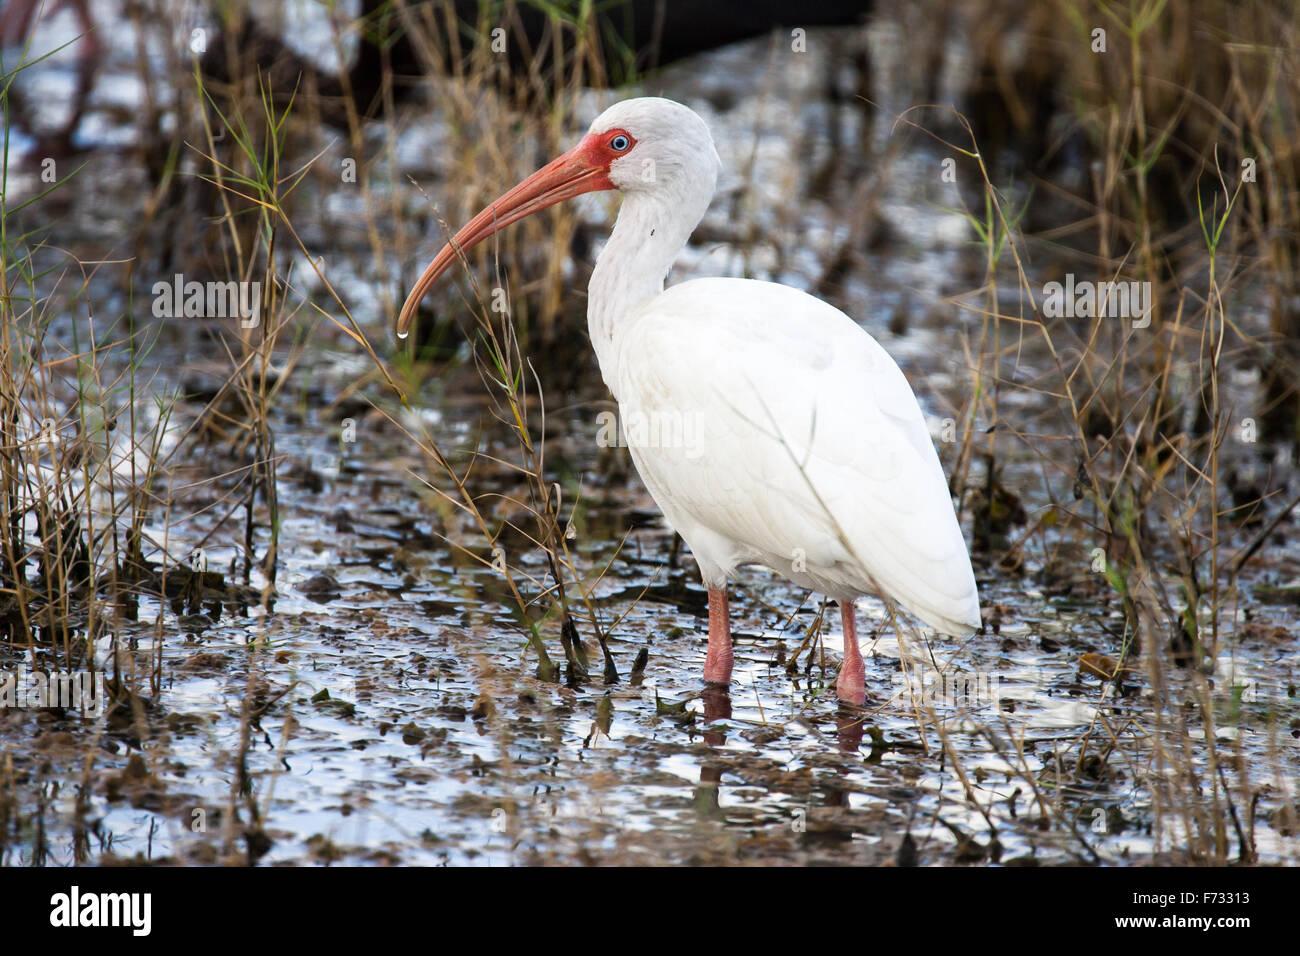 Un Ibis blanc pataugeant dans la zone humide. Photo Stock